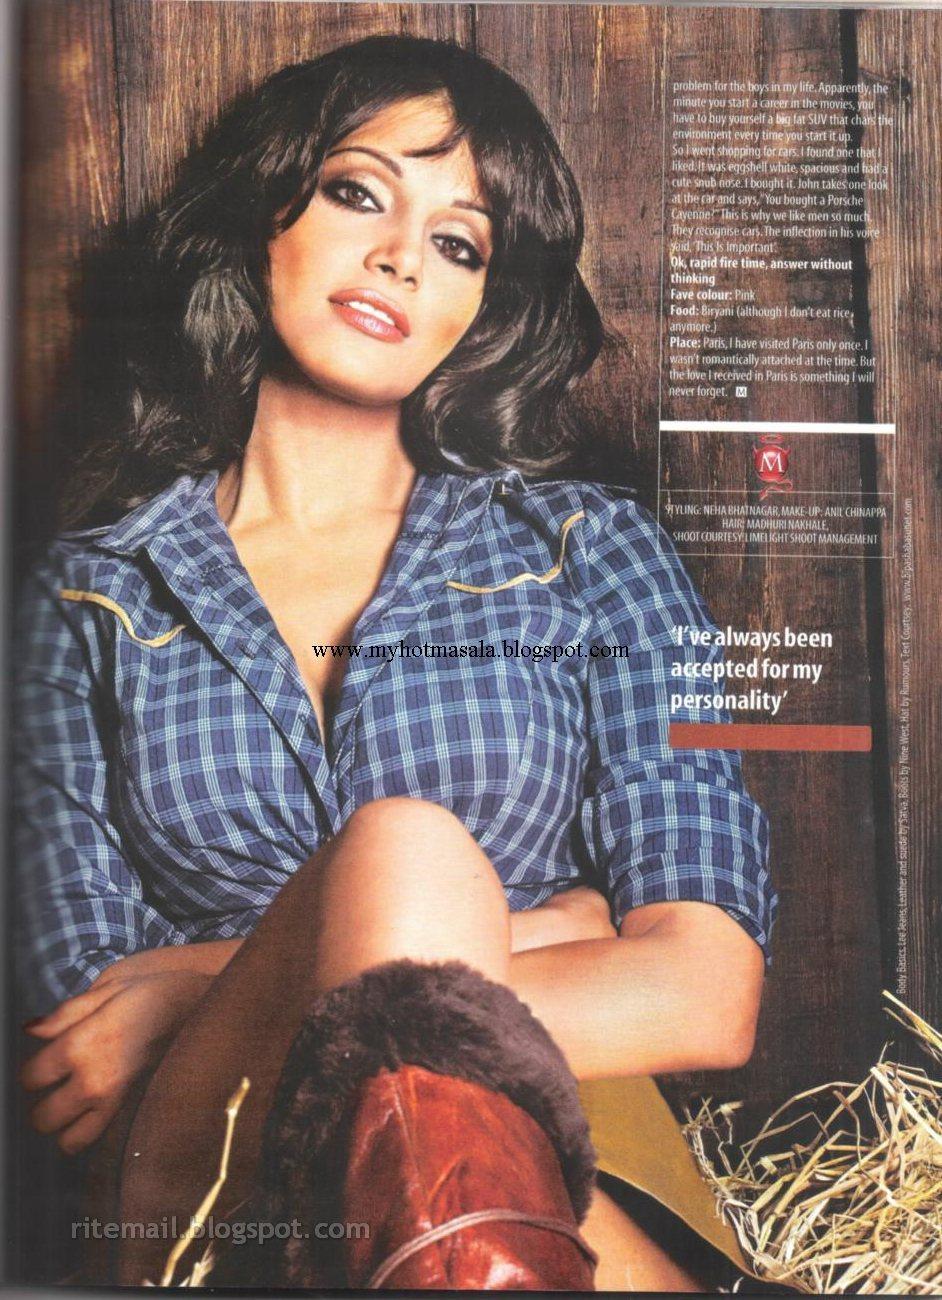 image Bipasha basu bollywood actress